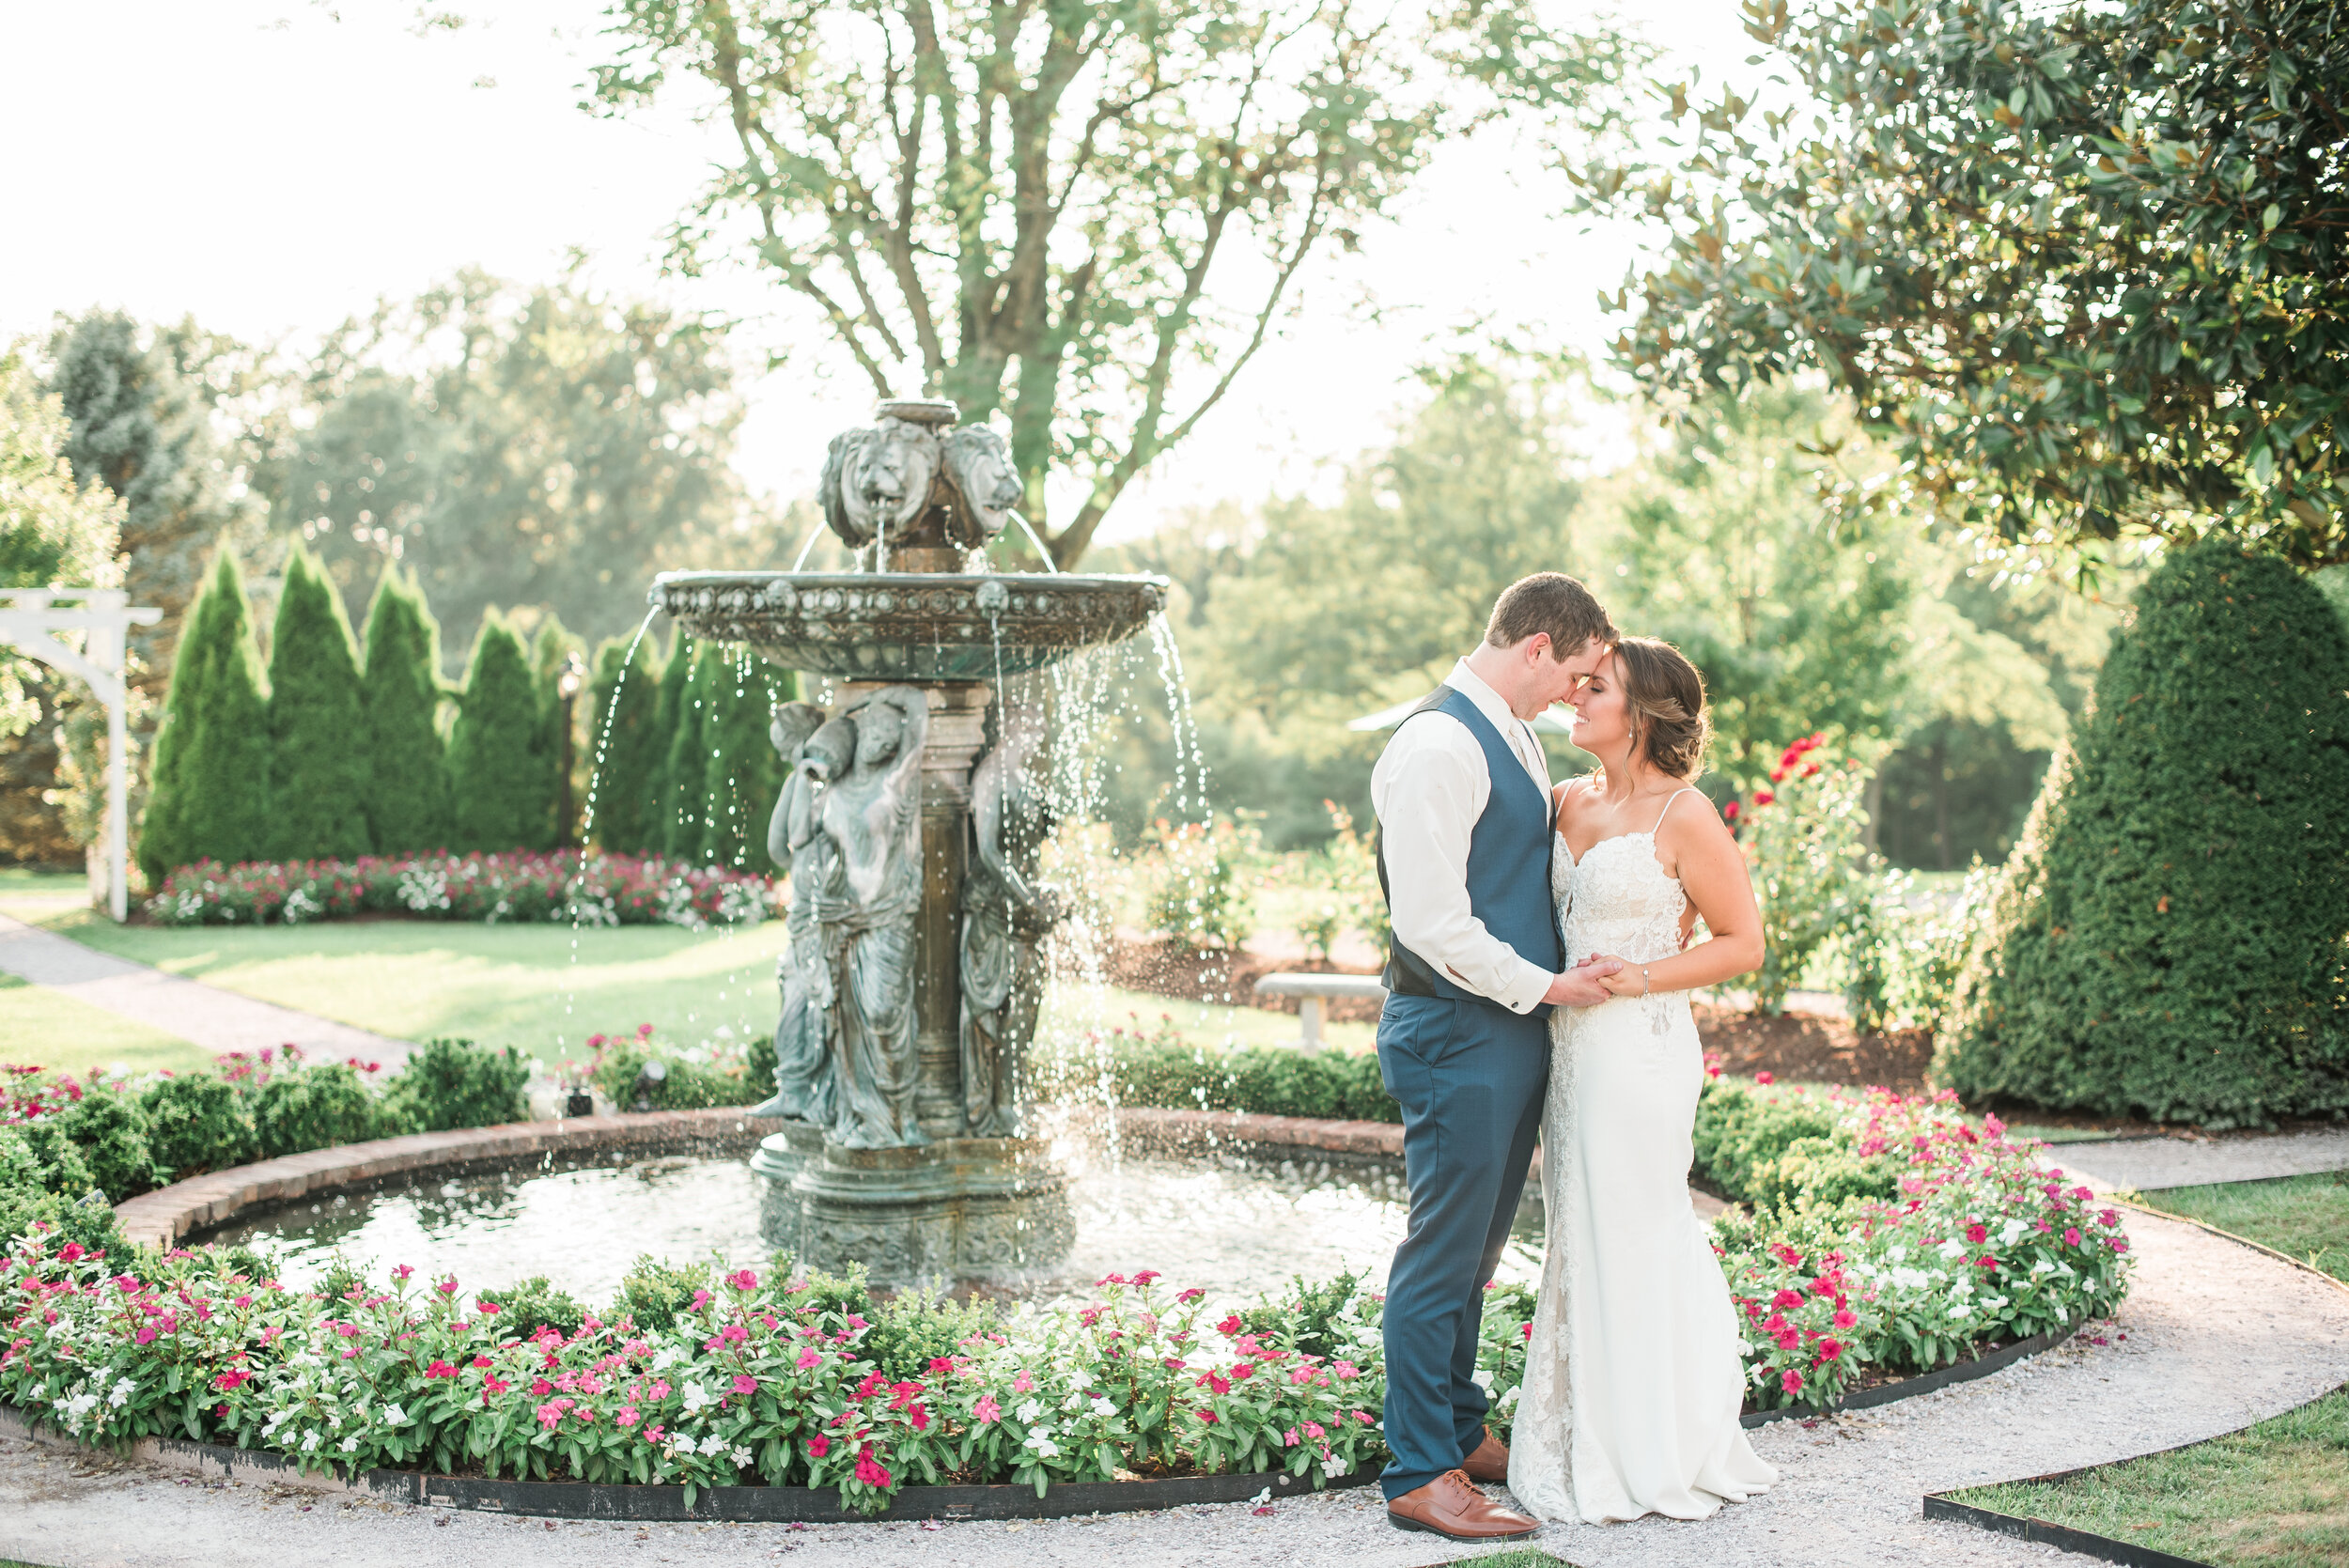 sowers-wedding-374.jpg